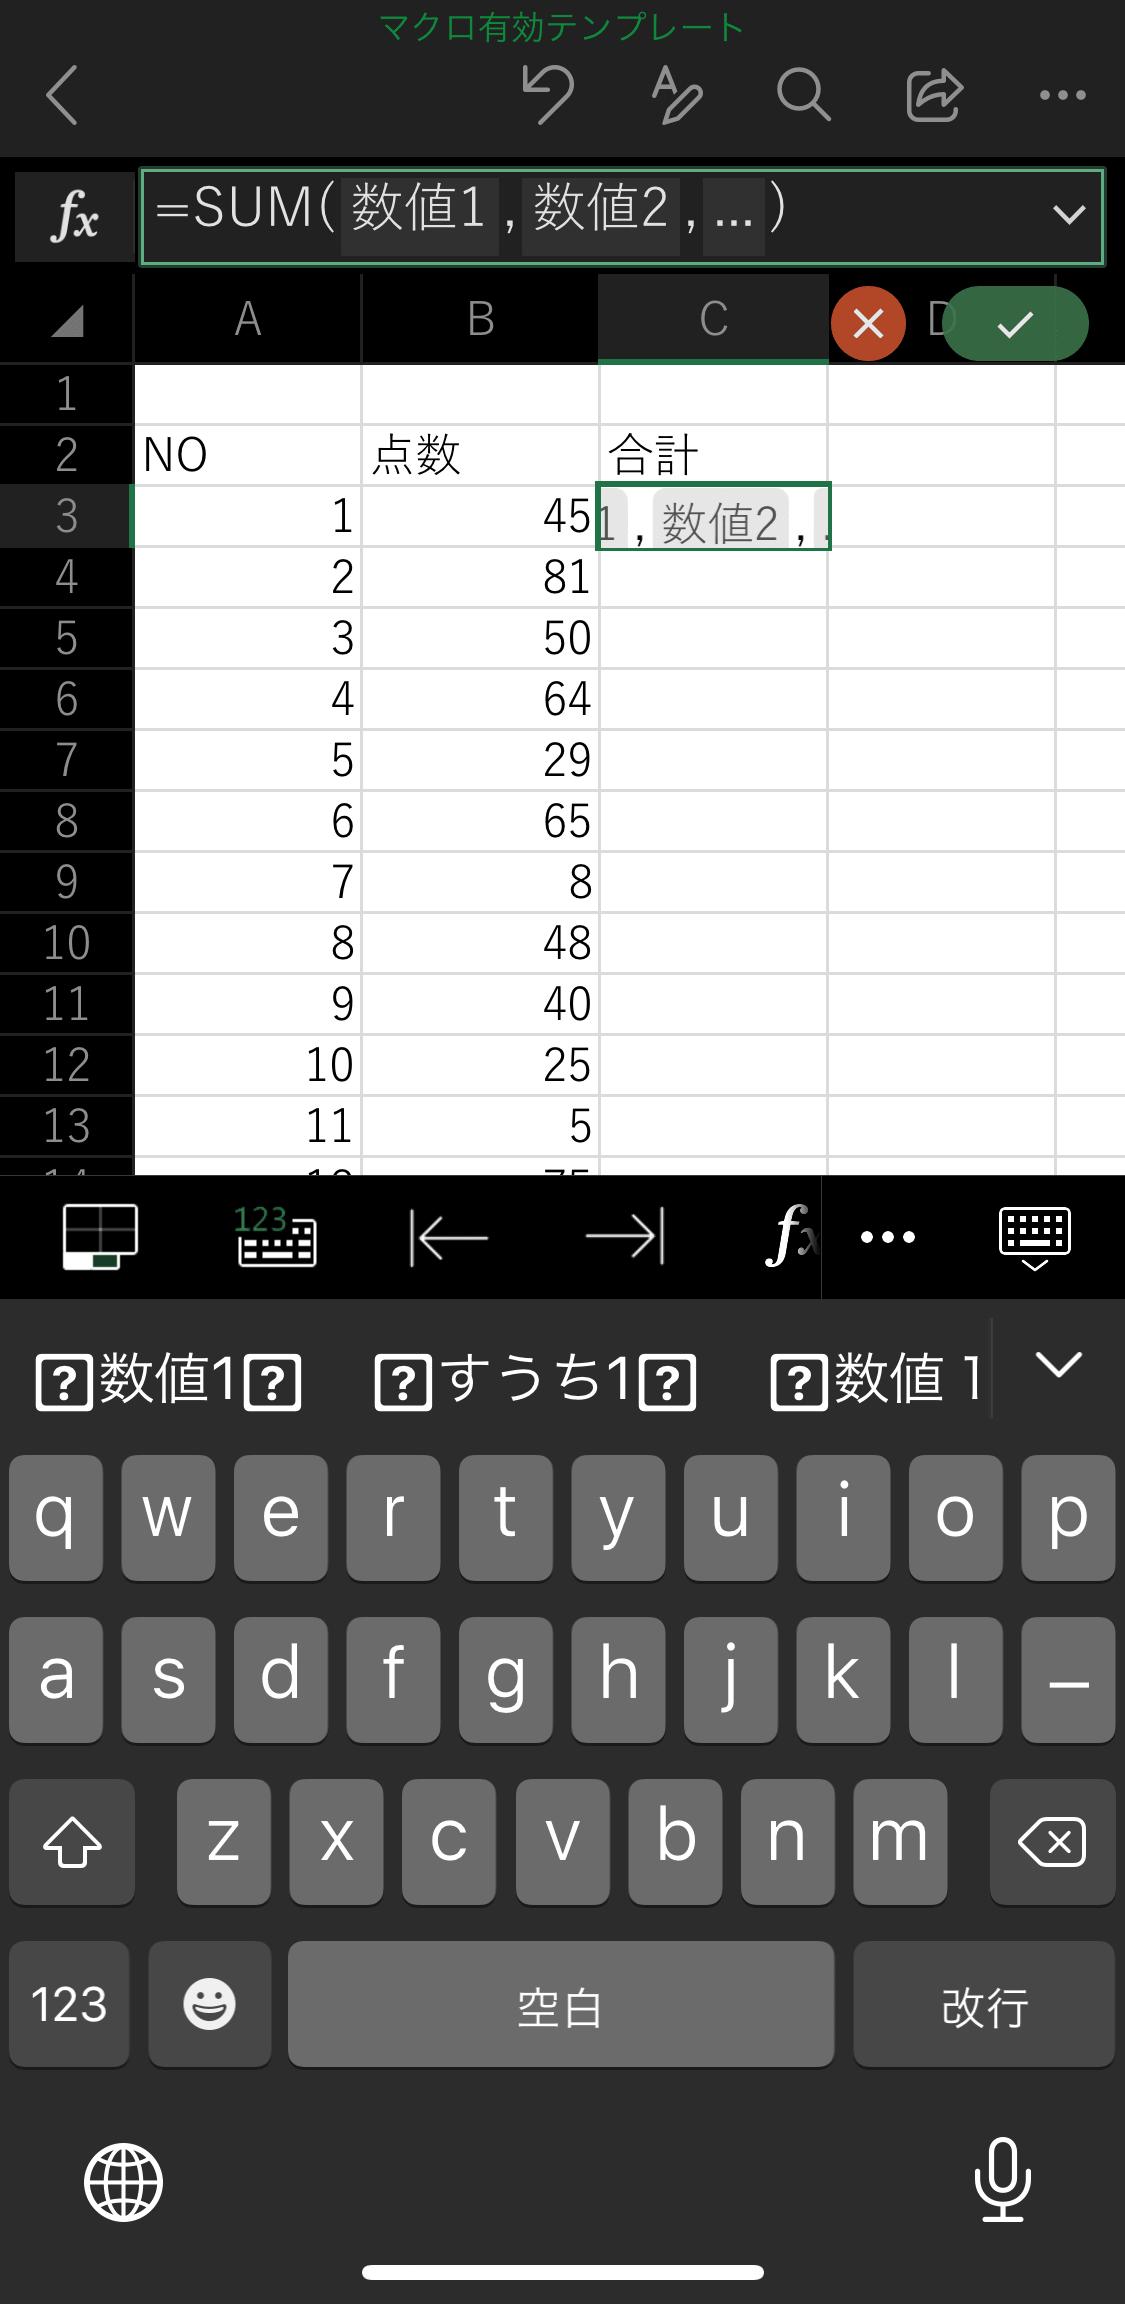 iPhoneでのエクセルアプリの使い方・編集方法・保存方法15